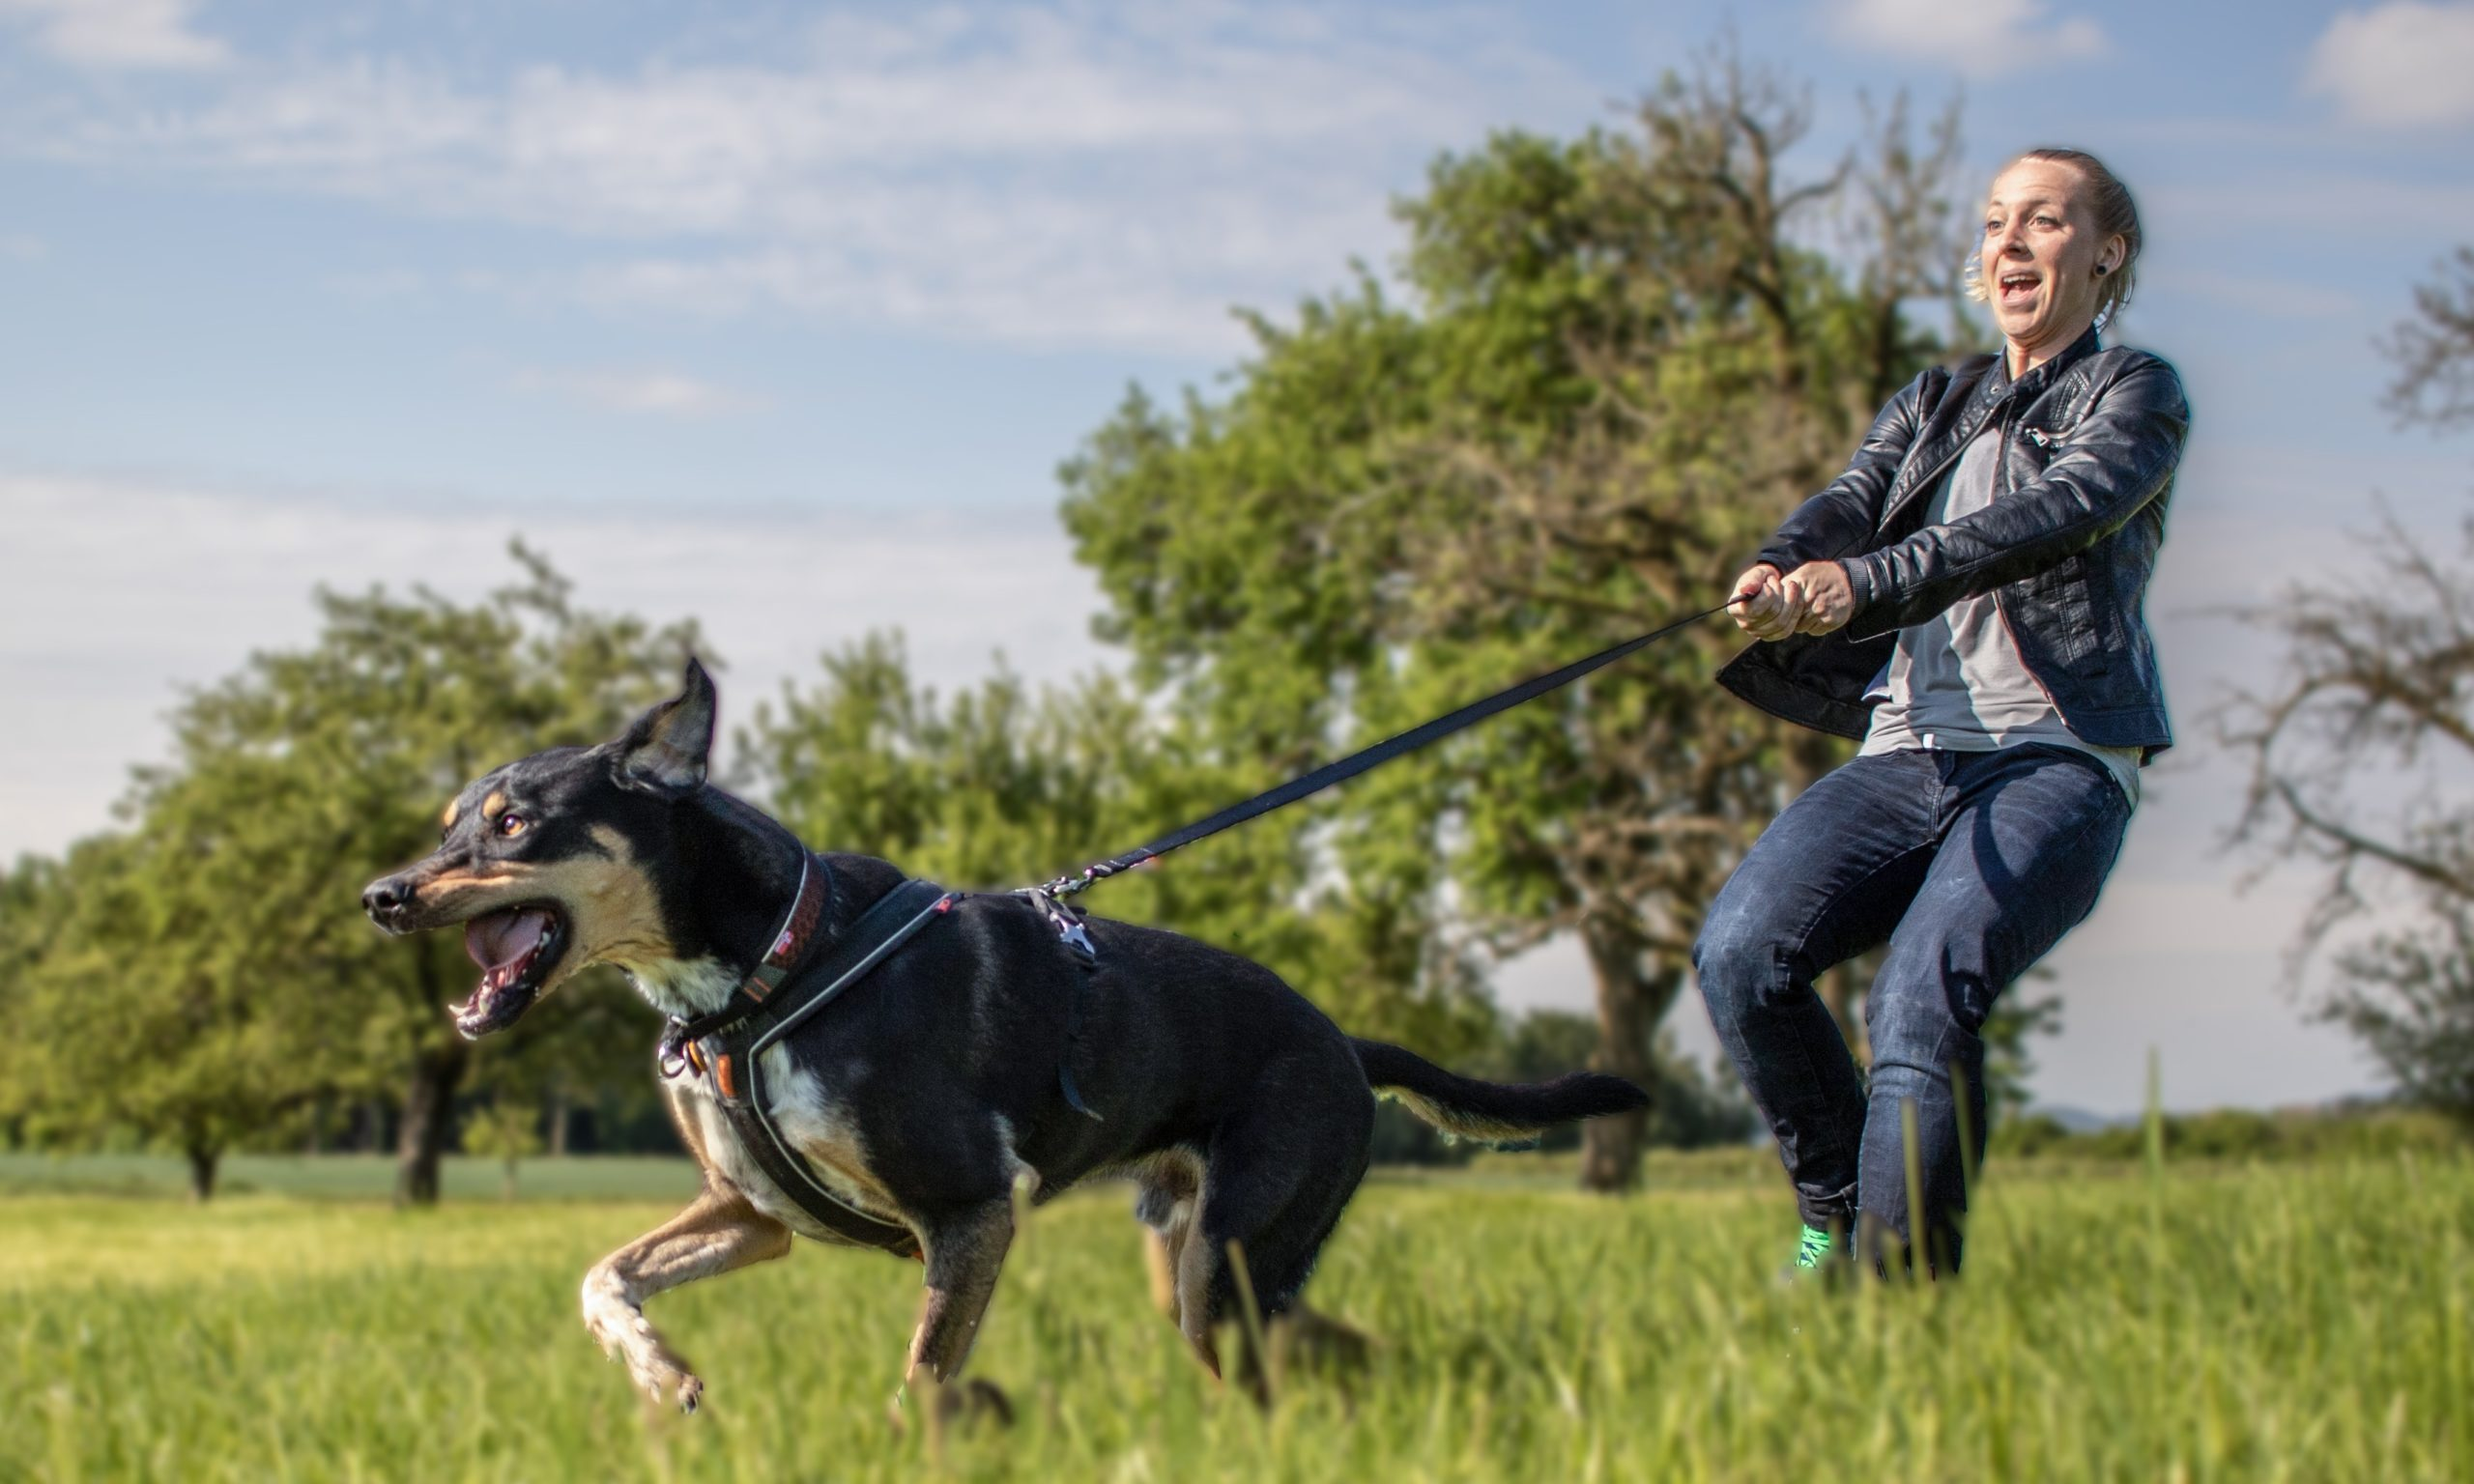 LakeDog Hundeschule Leinenführigkeit